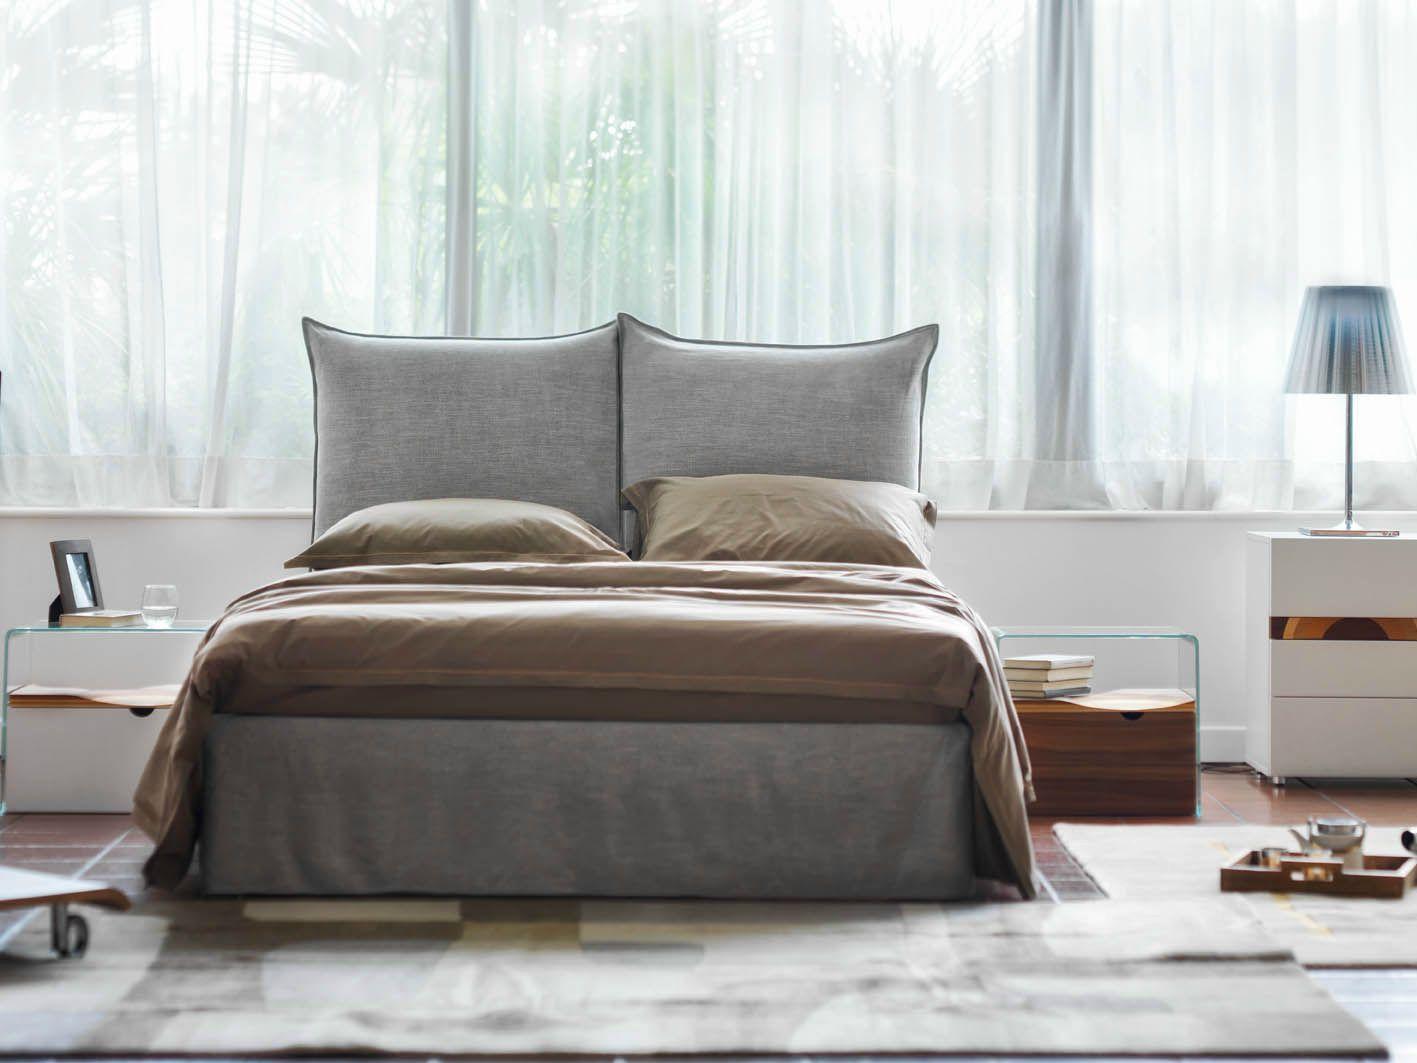 Milos Bedroom Furniture Milos Double Bed By Hormit